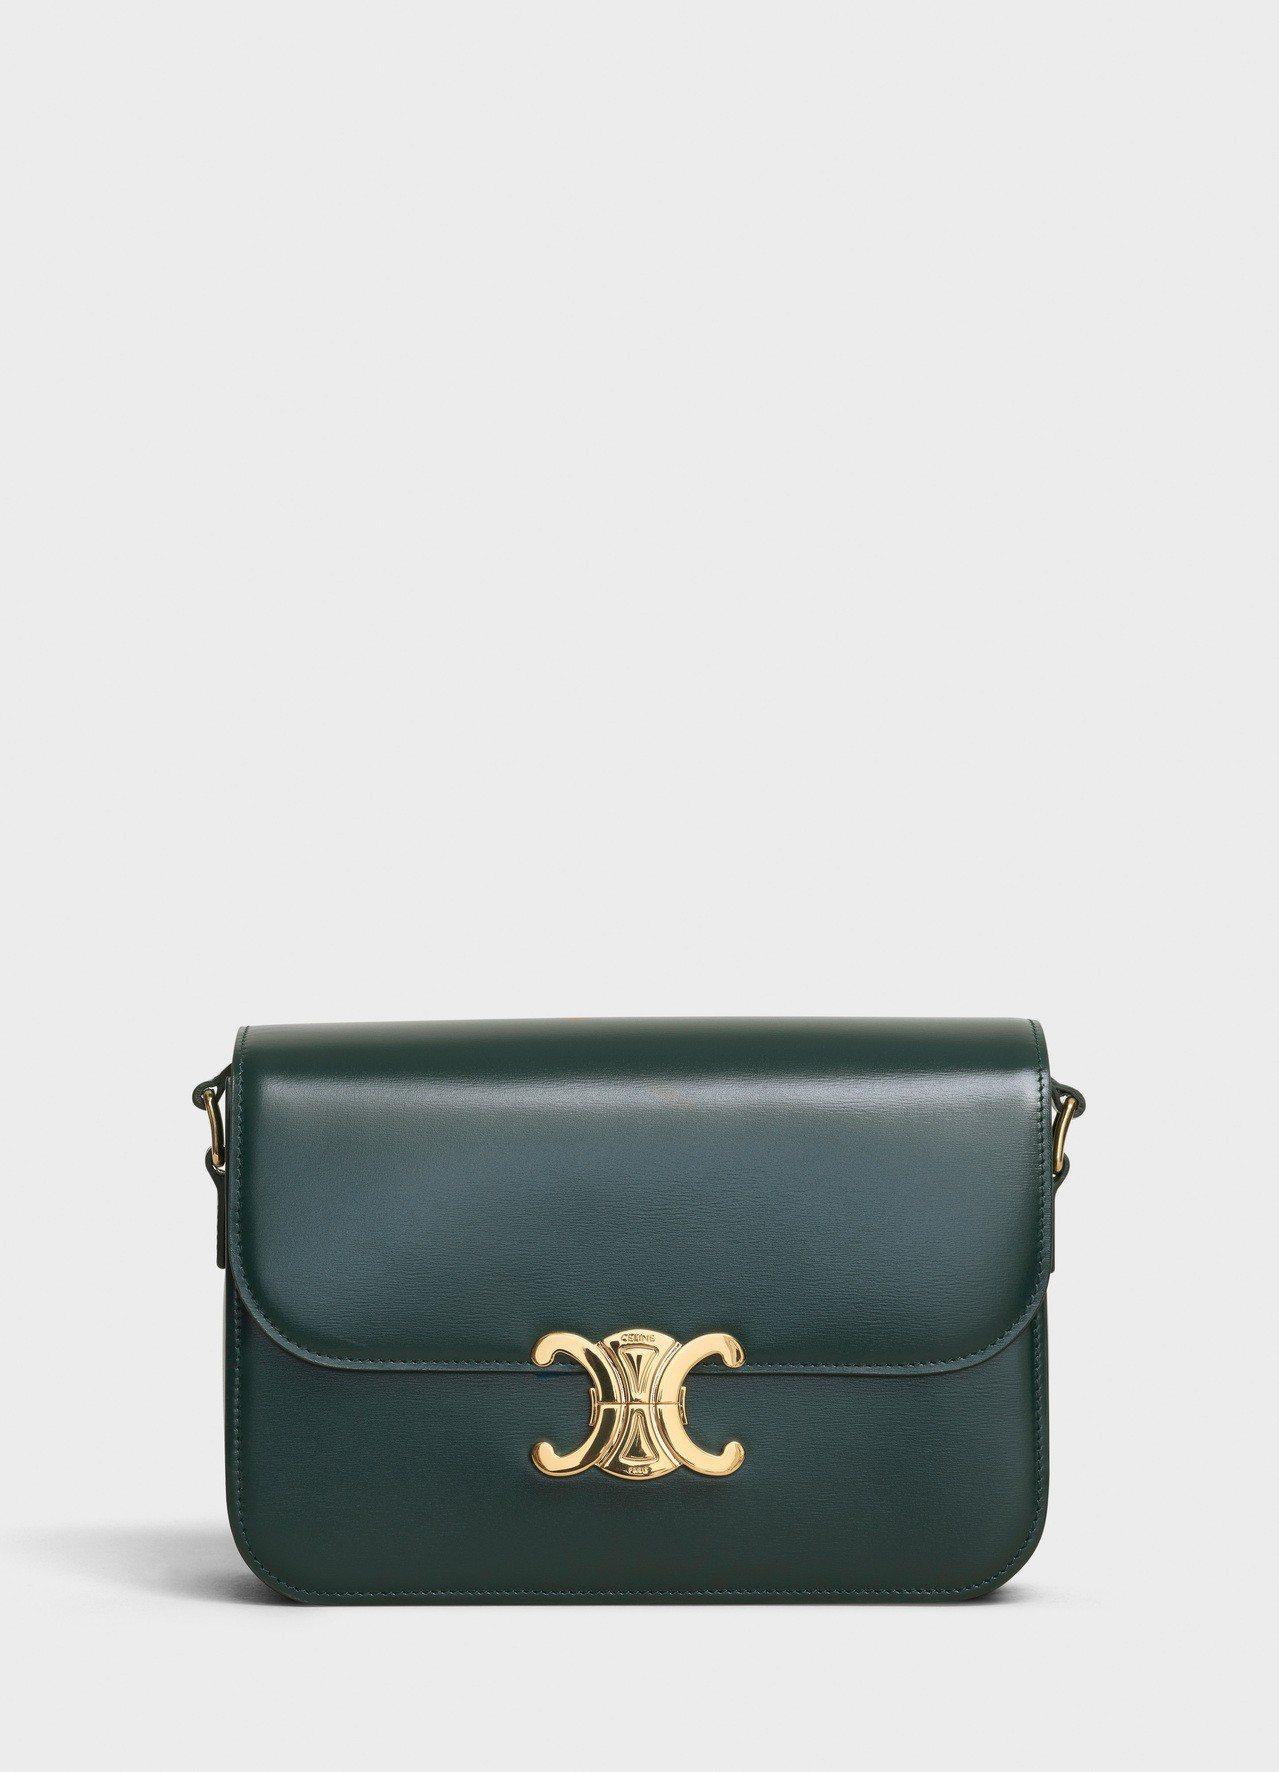 Triomphe亞馬遜綠光滑小牛皮中型肩背包,售價11萬5,000元。圖/CEL...